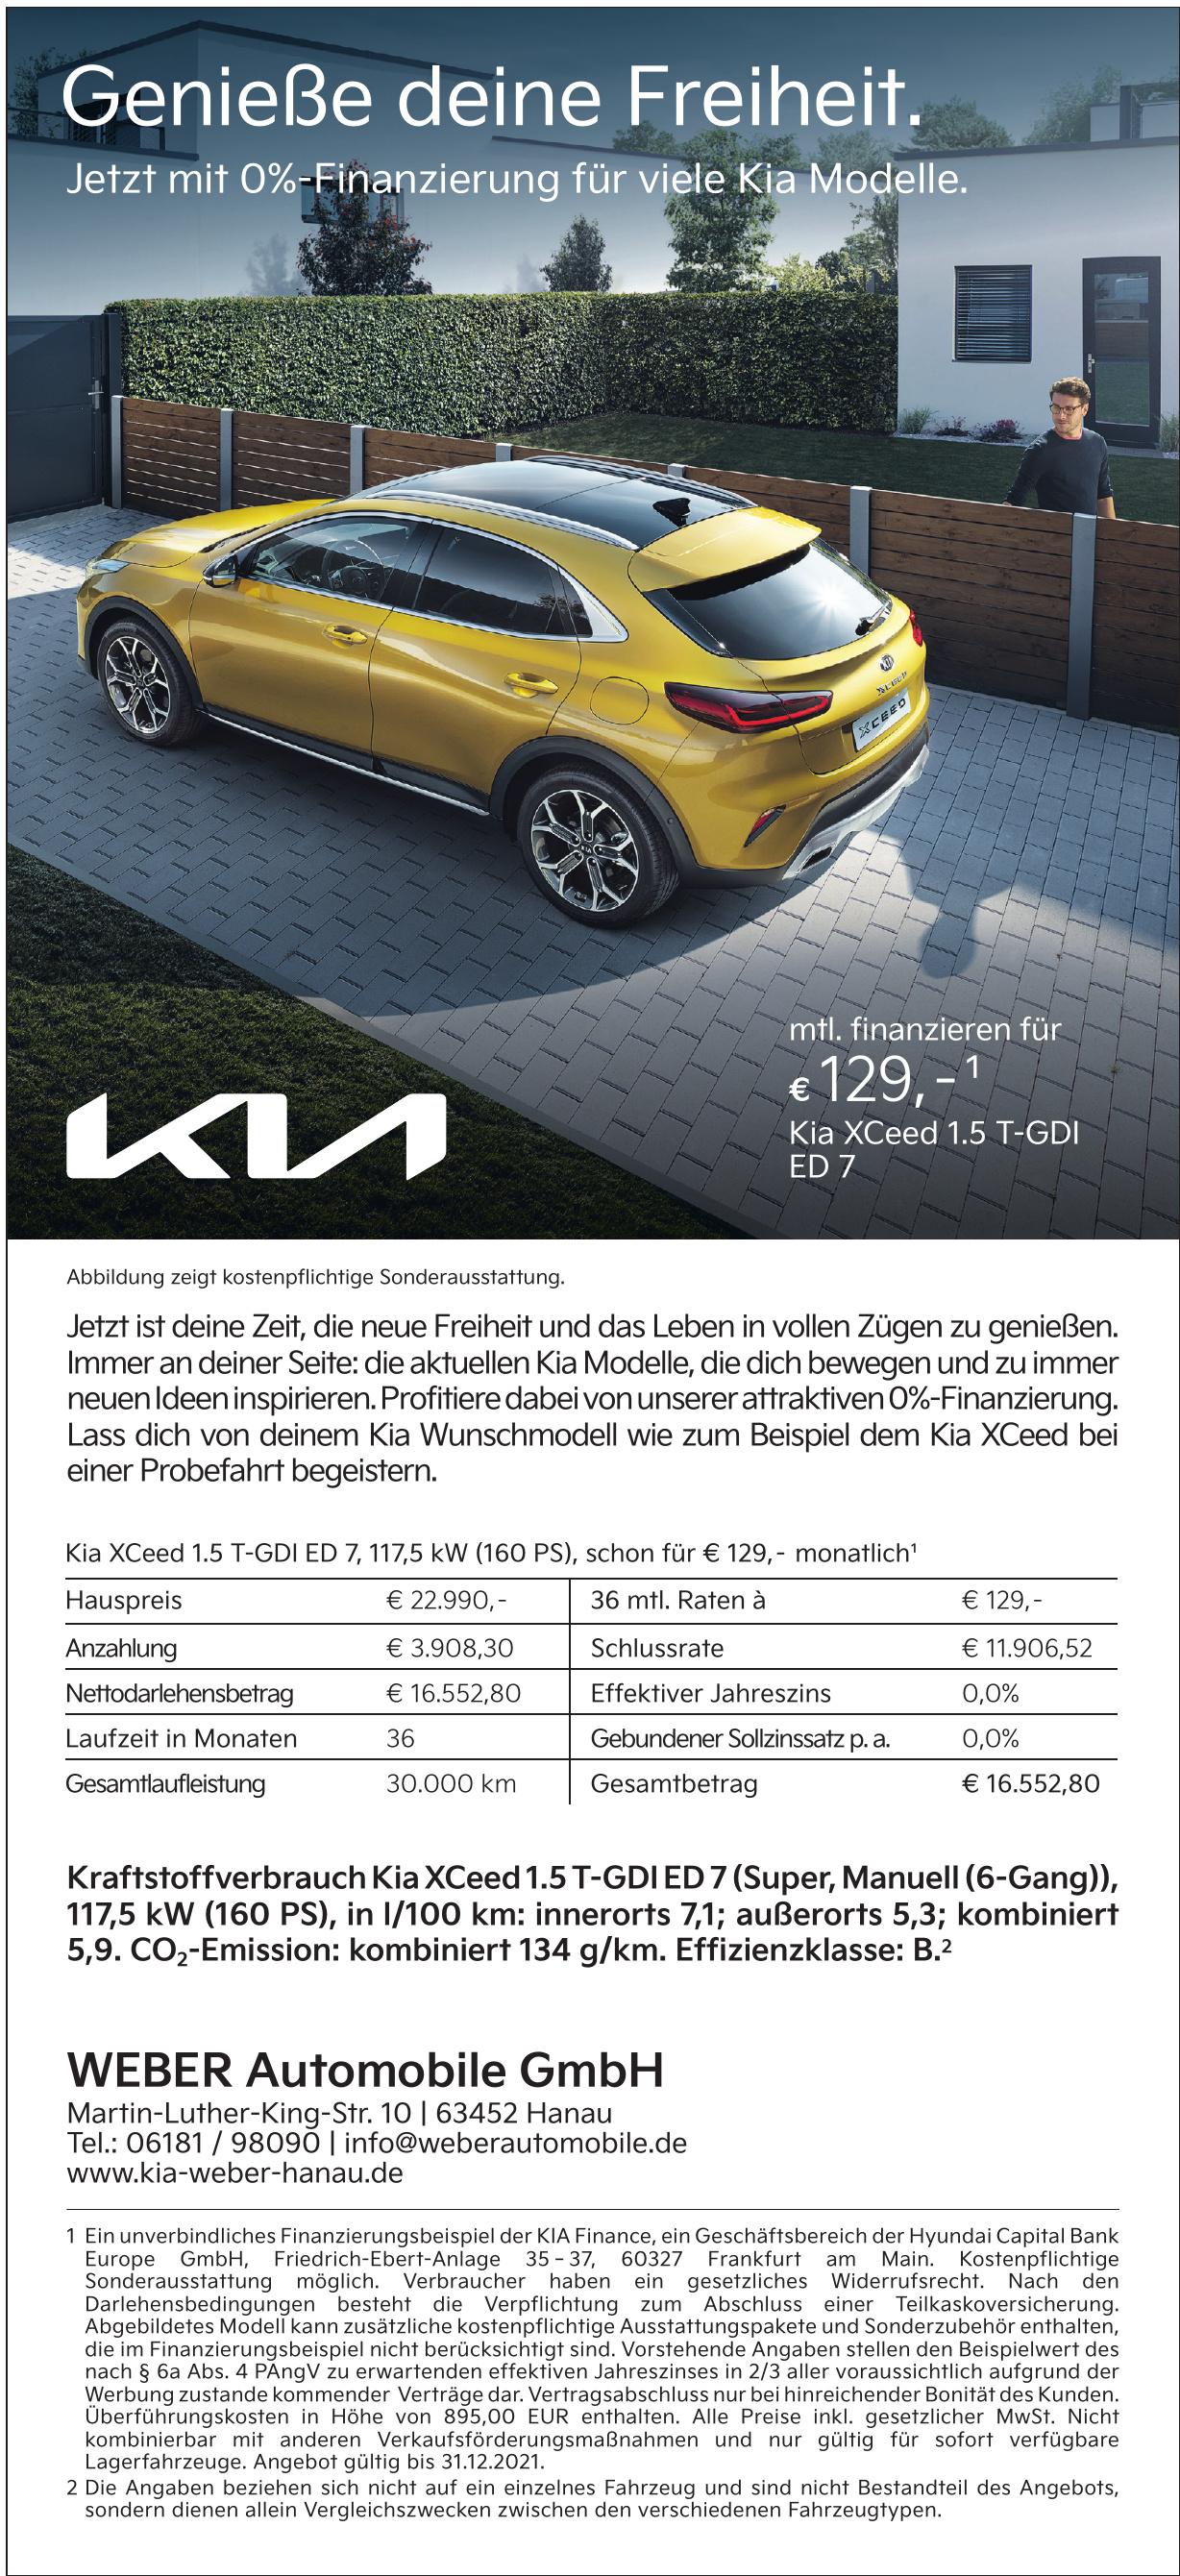 WEBER Automobile GmbH